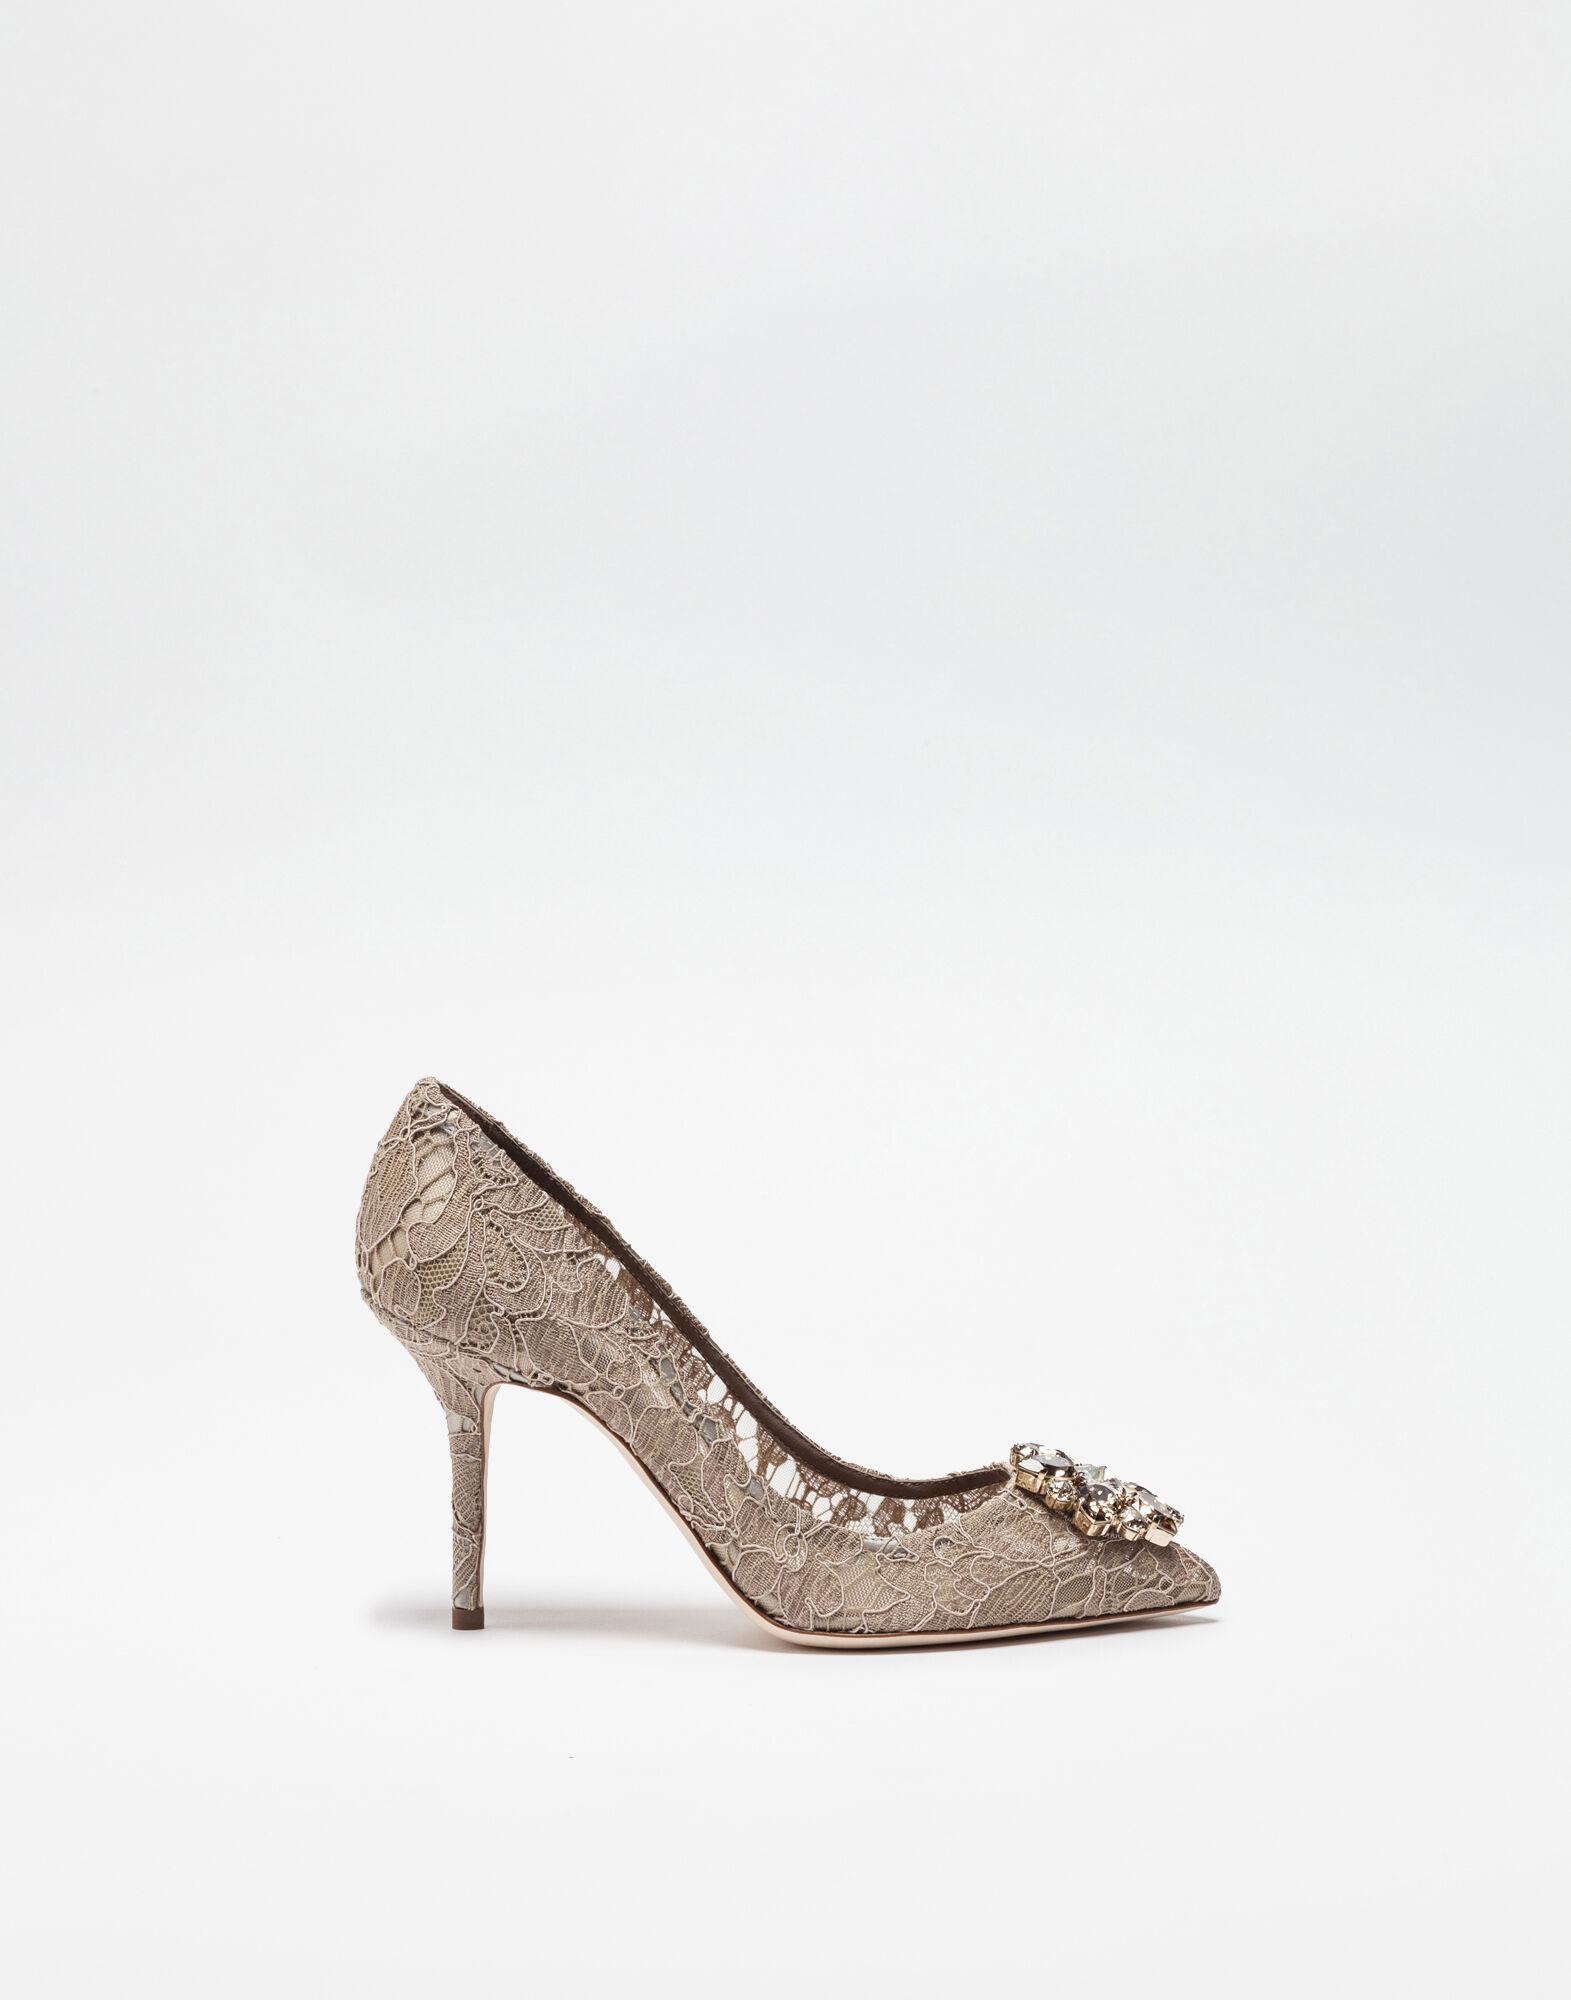 Dolce and Gabbana Bellucci Lace Pumps Fard R9330